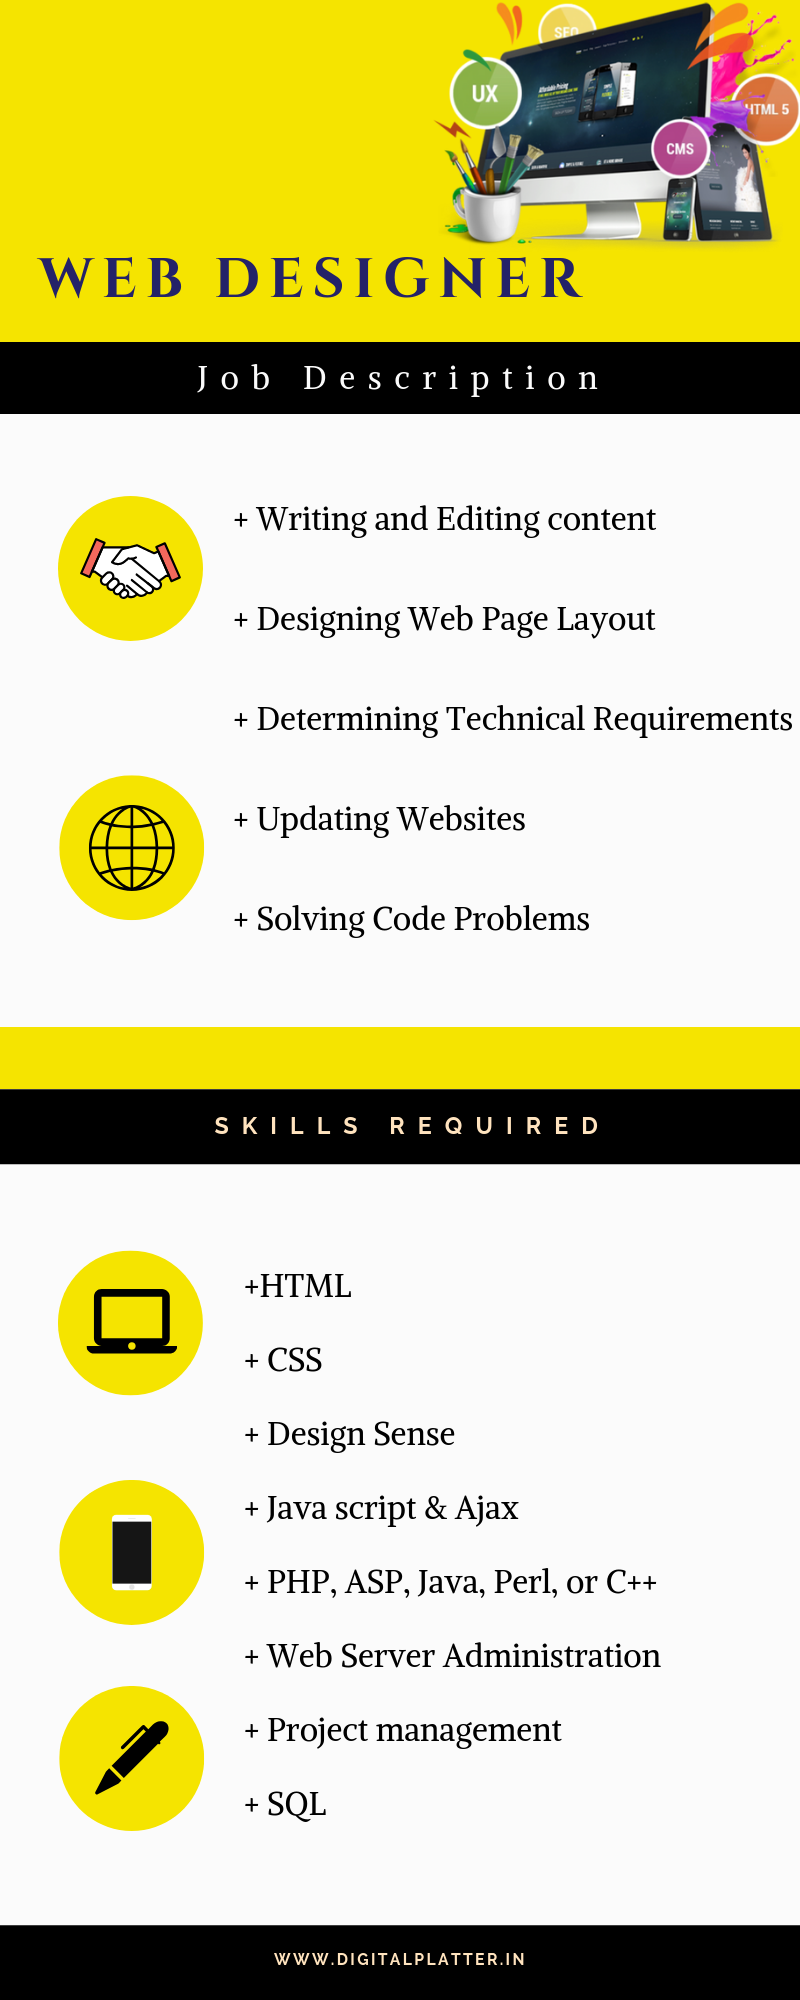 Web Designer Job Description Web Design Jobs Descriptive Writing Web Design